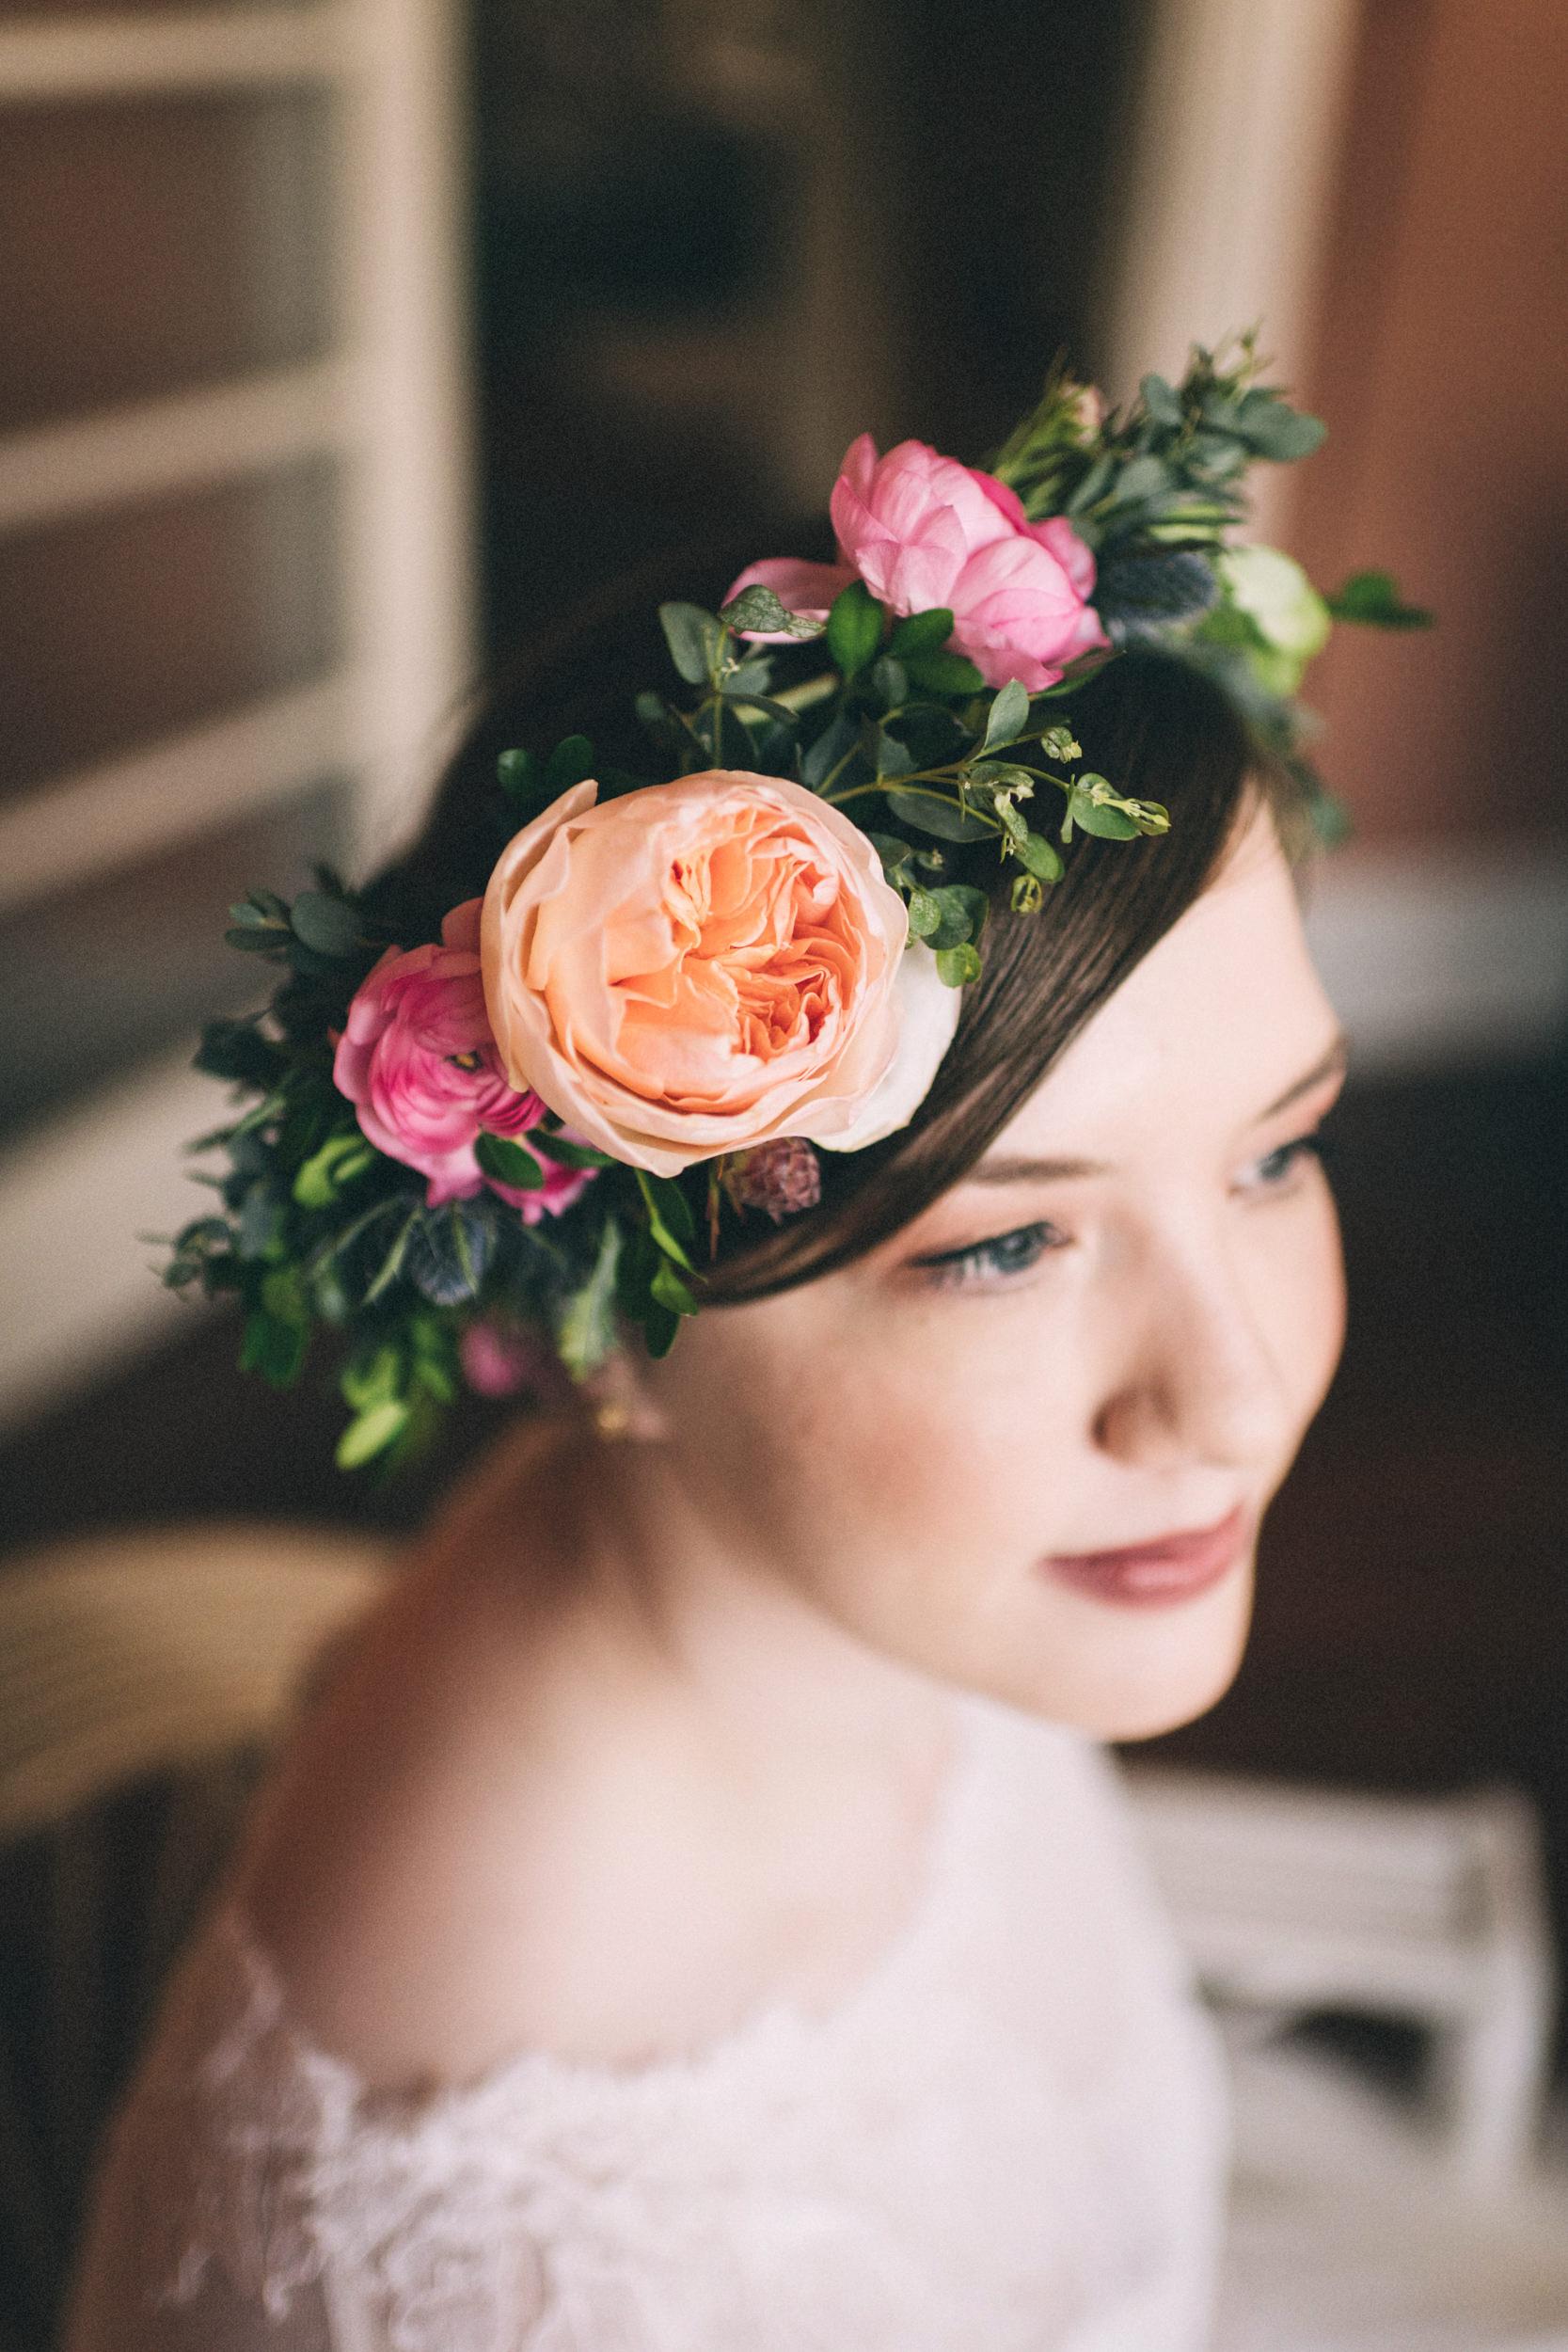 lauren-dean-wedding-grand-lodge-kentucky-sarah-katherine-davis-photography-117edit.jpg